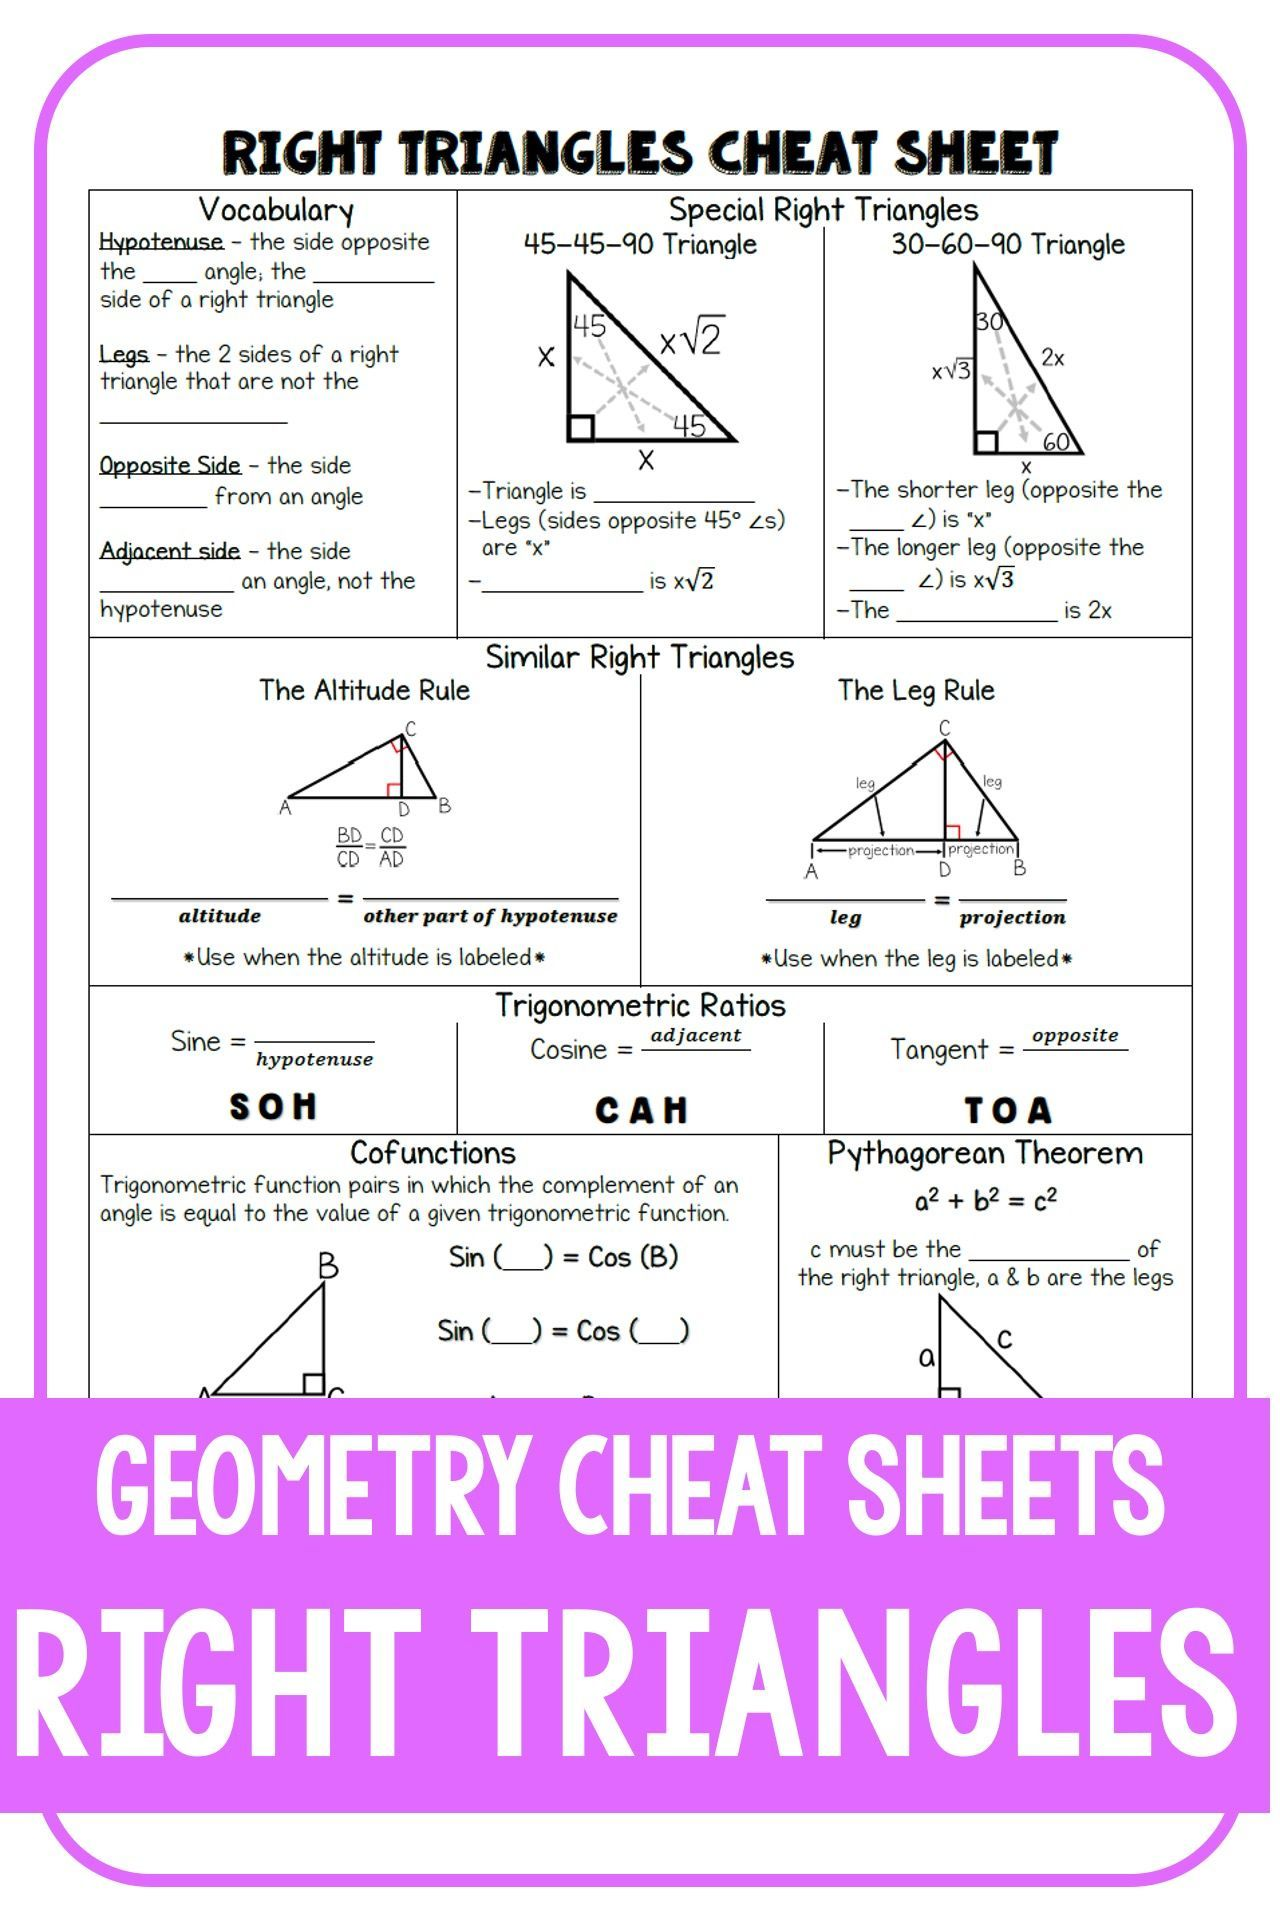 Geometry Cheat Sheet: Right Triangles   High school math teacher [ 1920 x 1280 Pixel ]